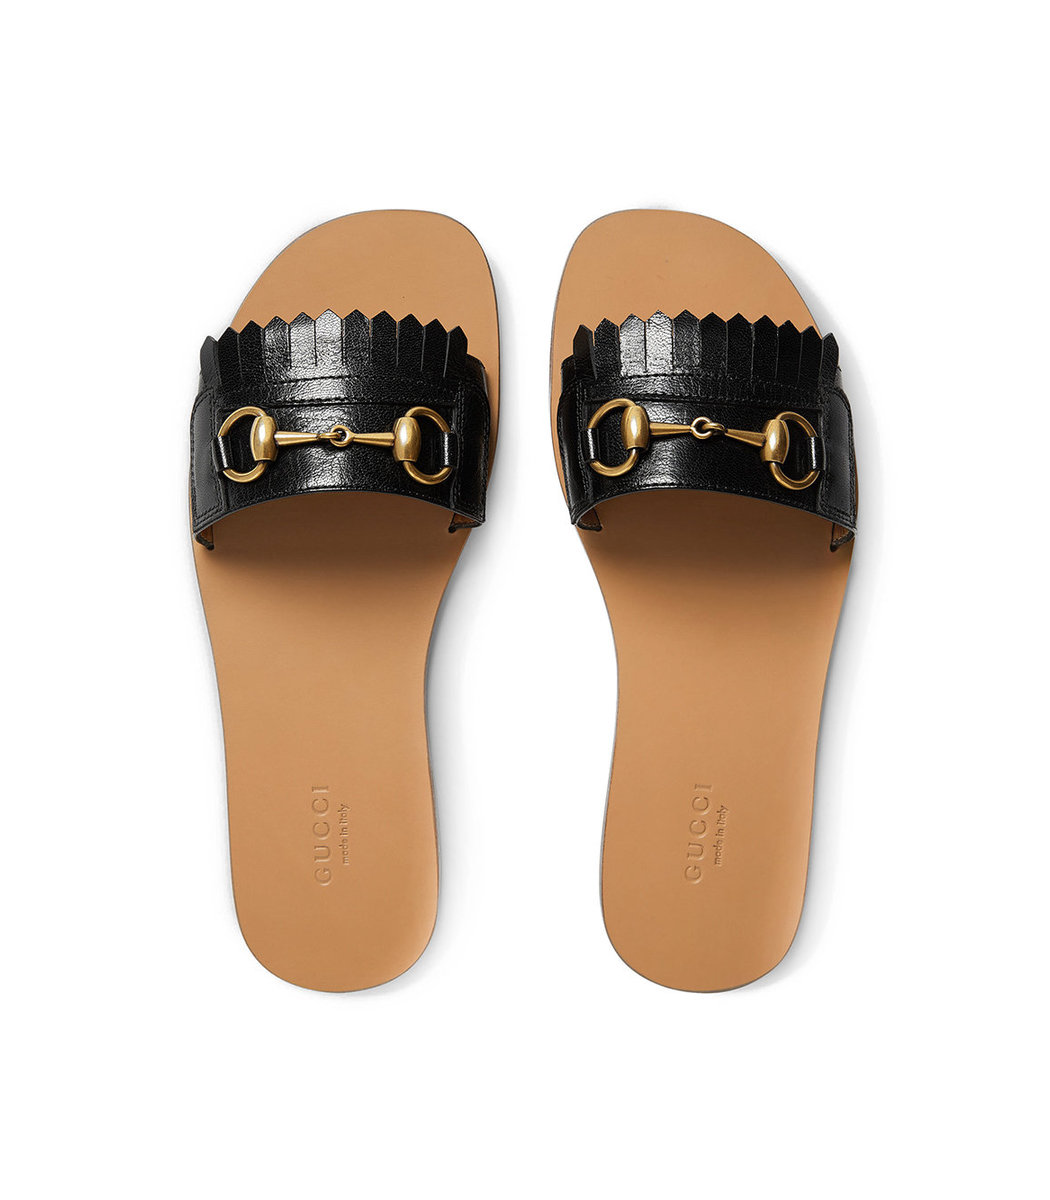 0c51266cb0f Gucci Varadero Fringed Slides - Black Leather Slides